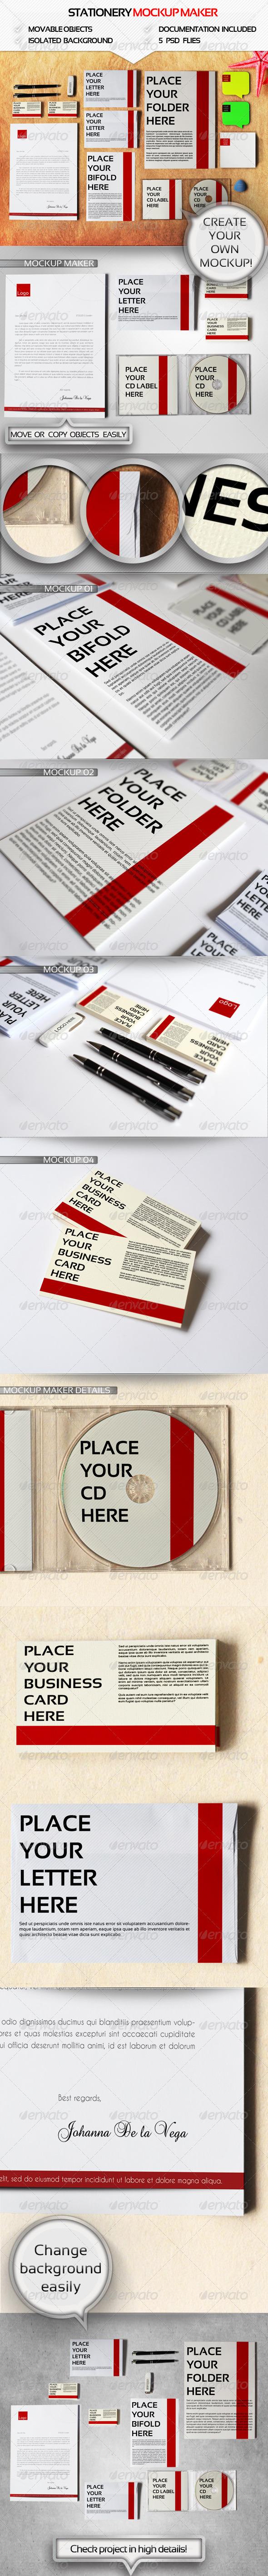 GraphicRiver Branding Mockup Maker 4511309